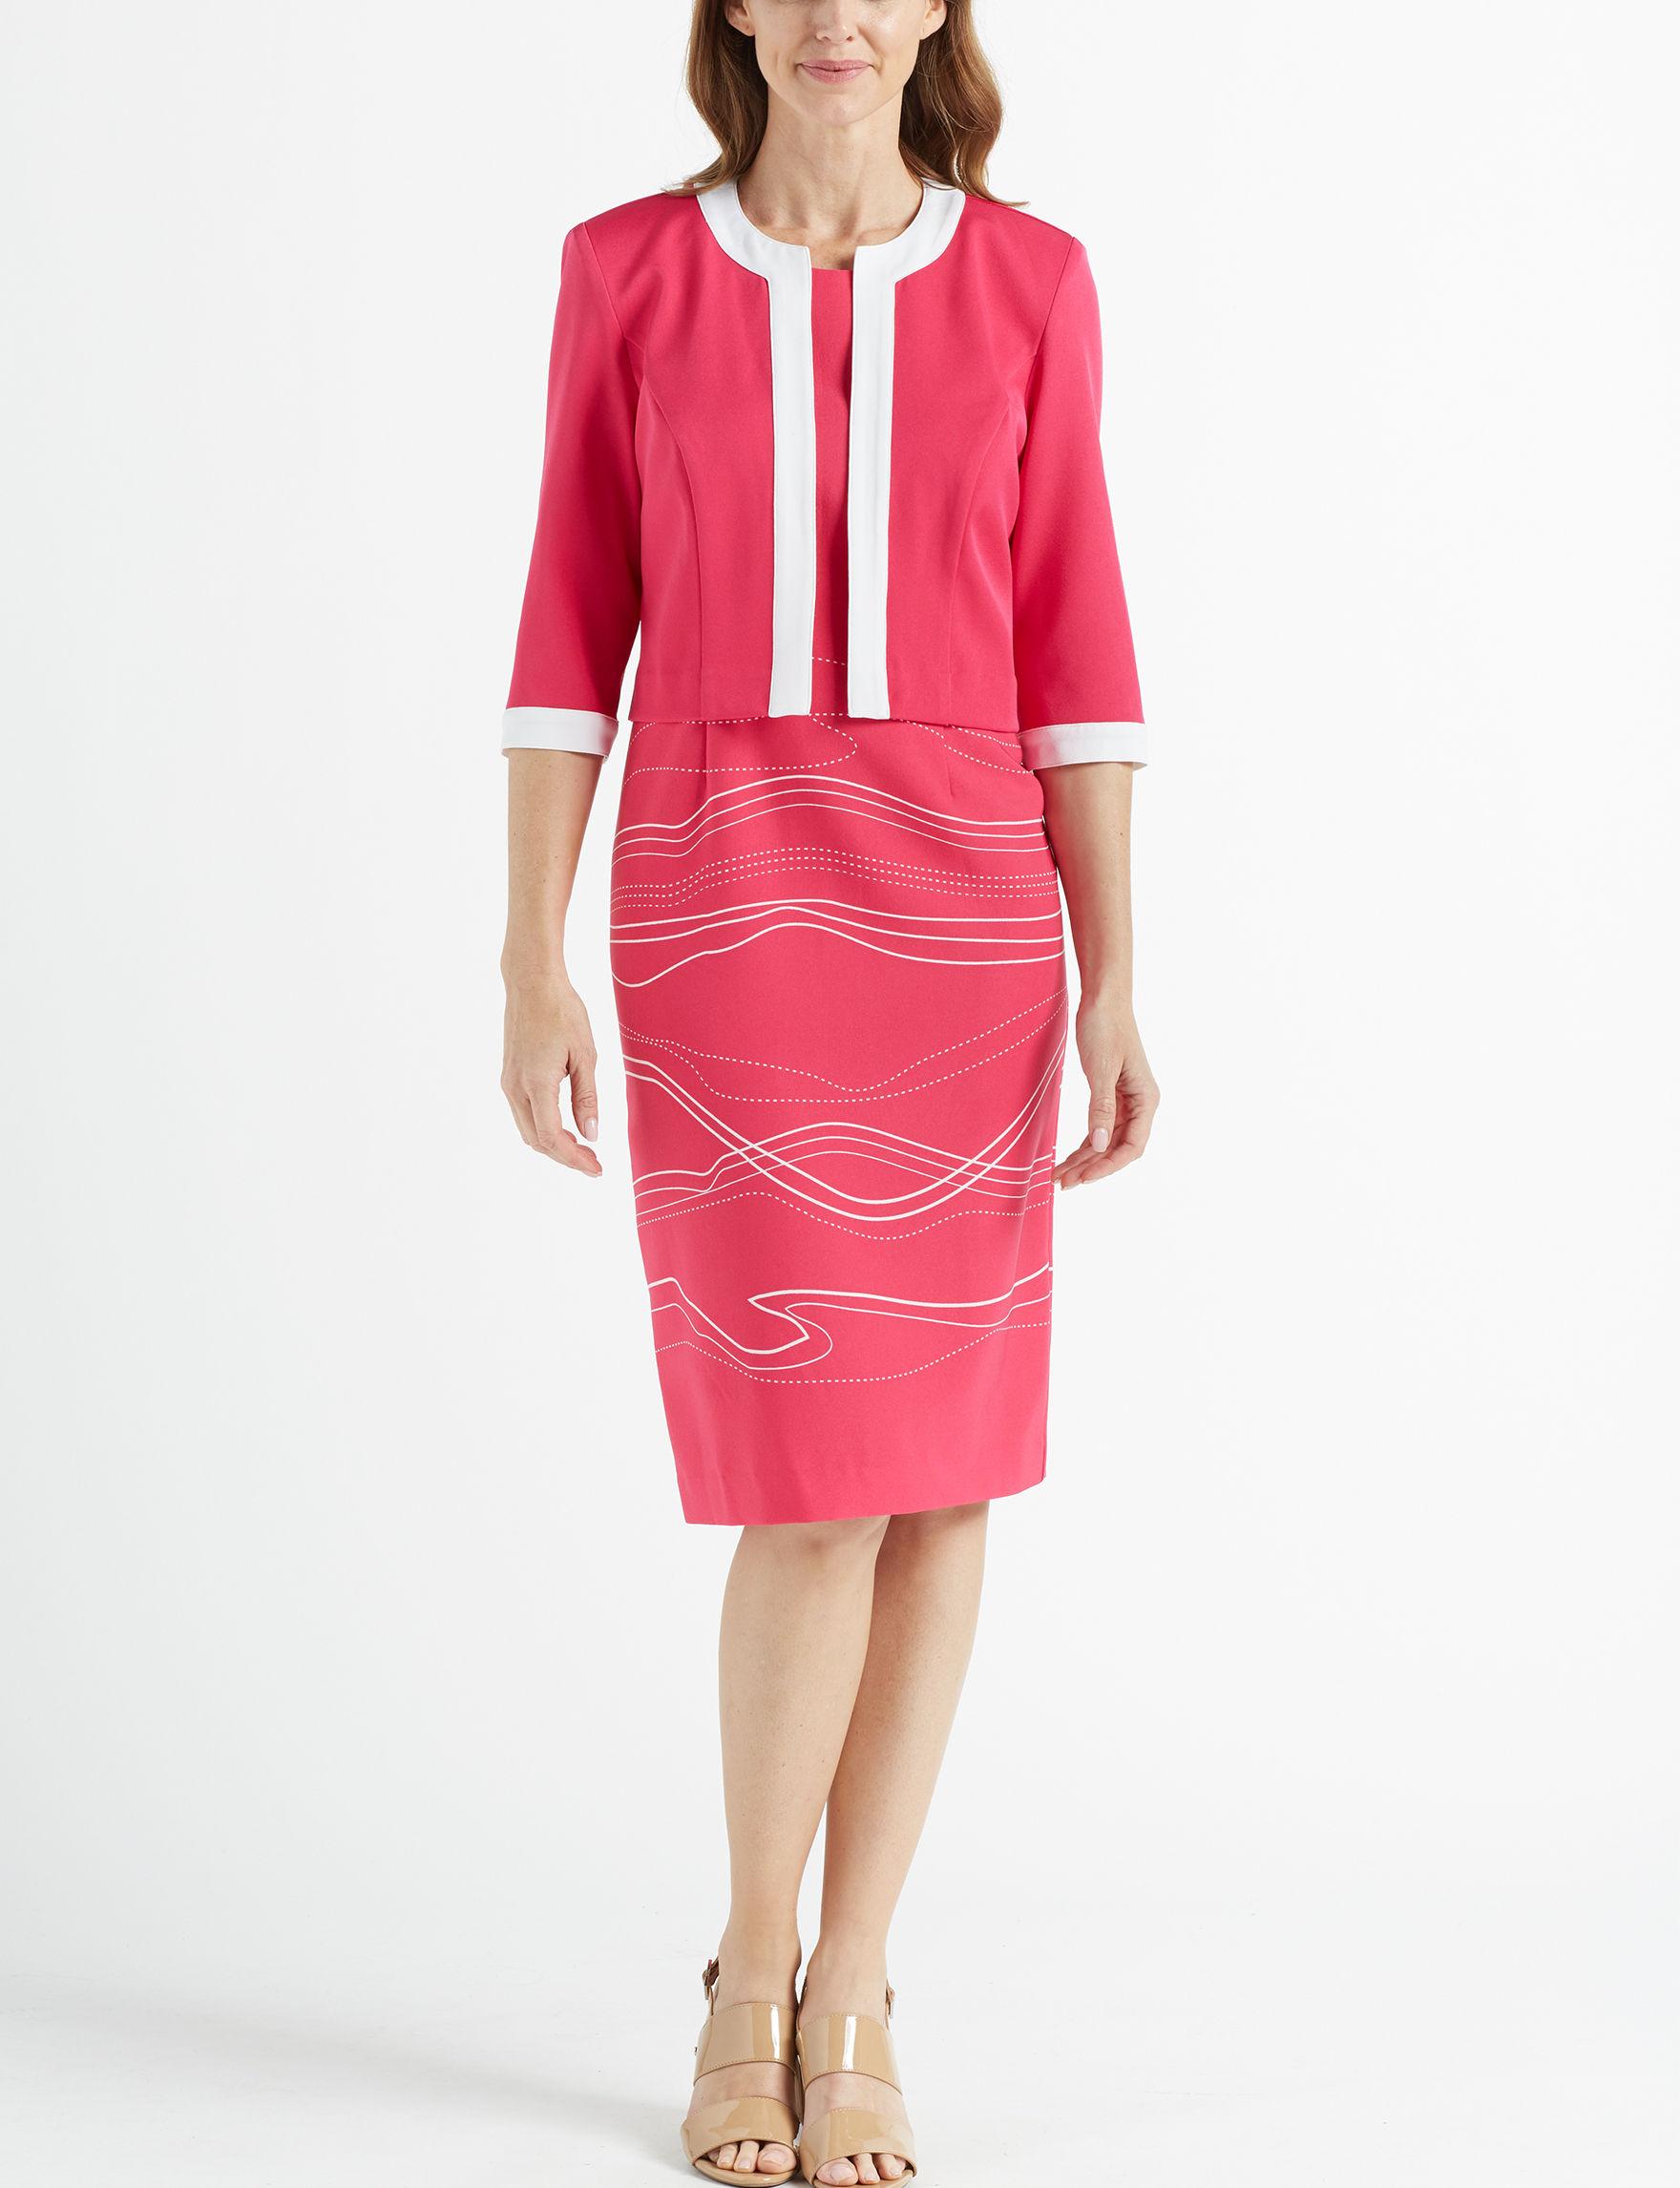 Maya Brooke Fuschia Everyday & Casual Jacket Dresses